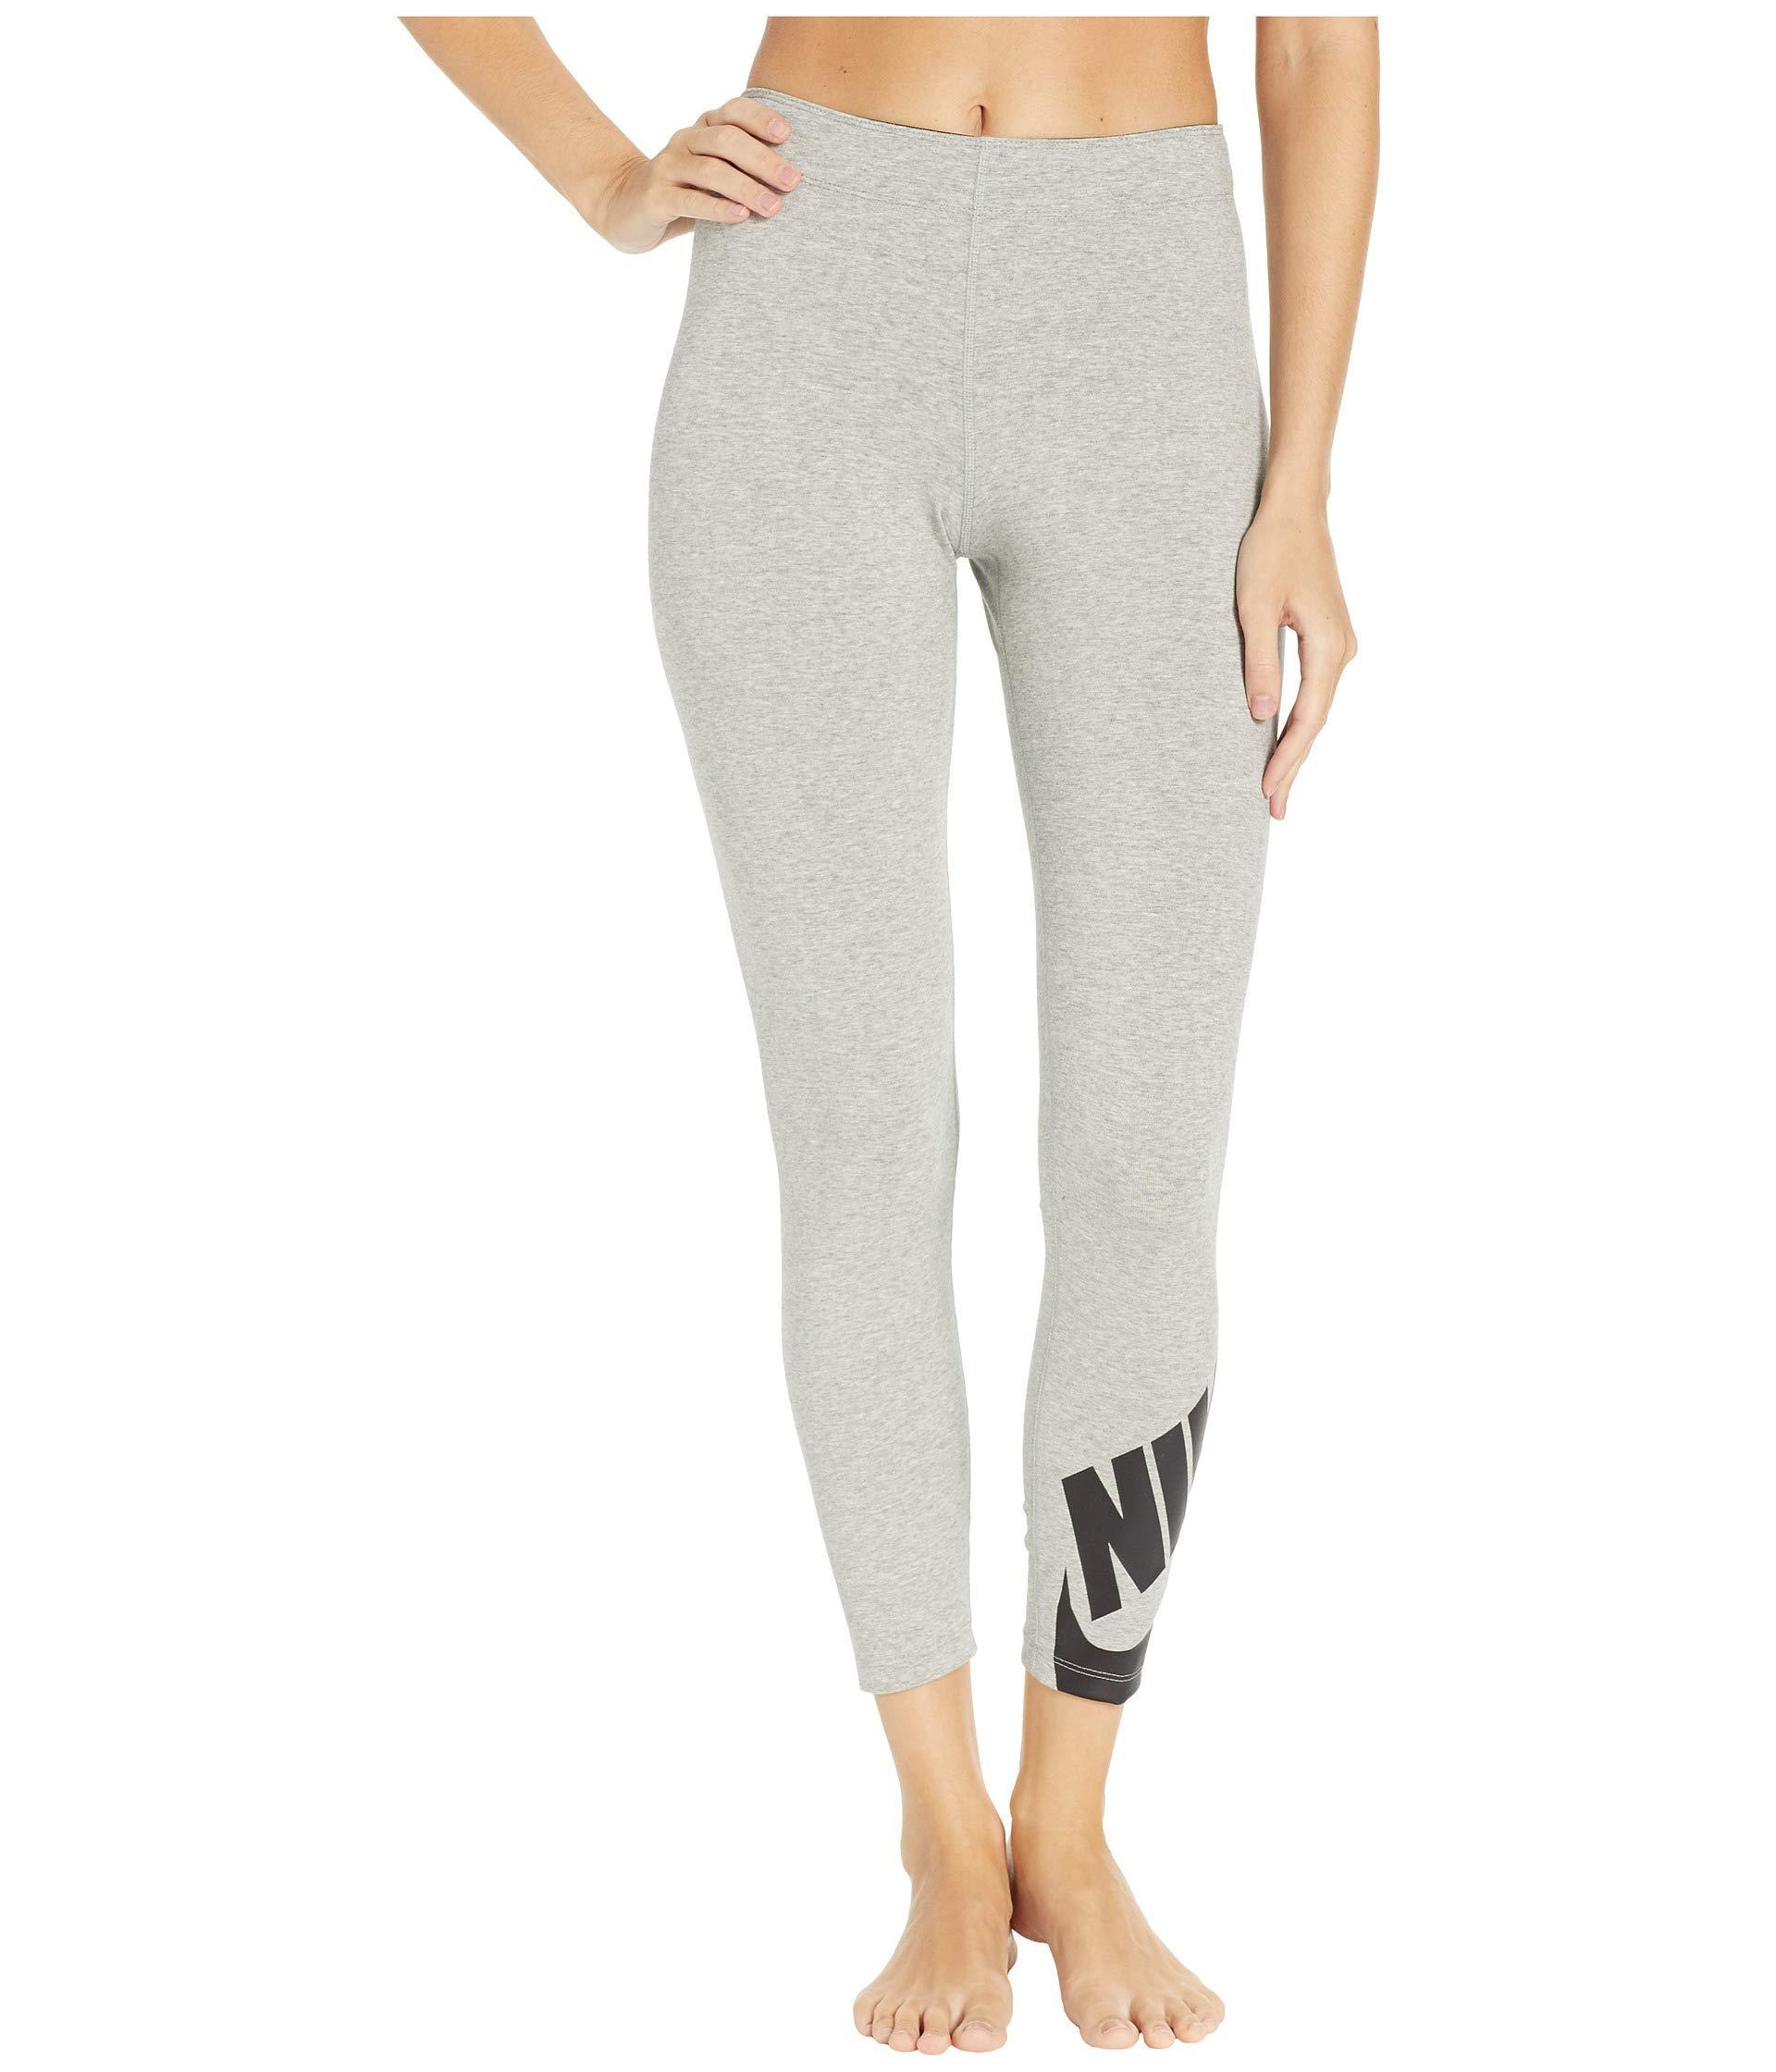 huge selection of 3b414 fd7ee Nike. Gray Sportswear Legasee Leggings 7 8 Futura ...